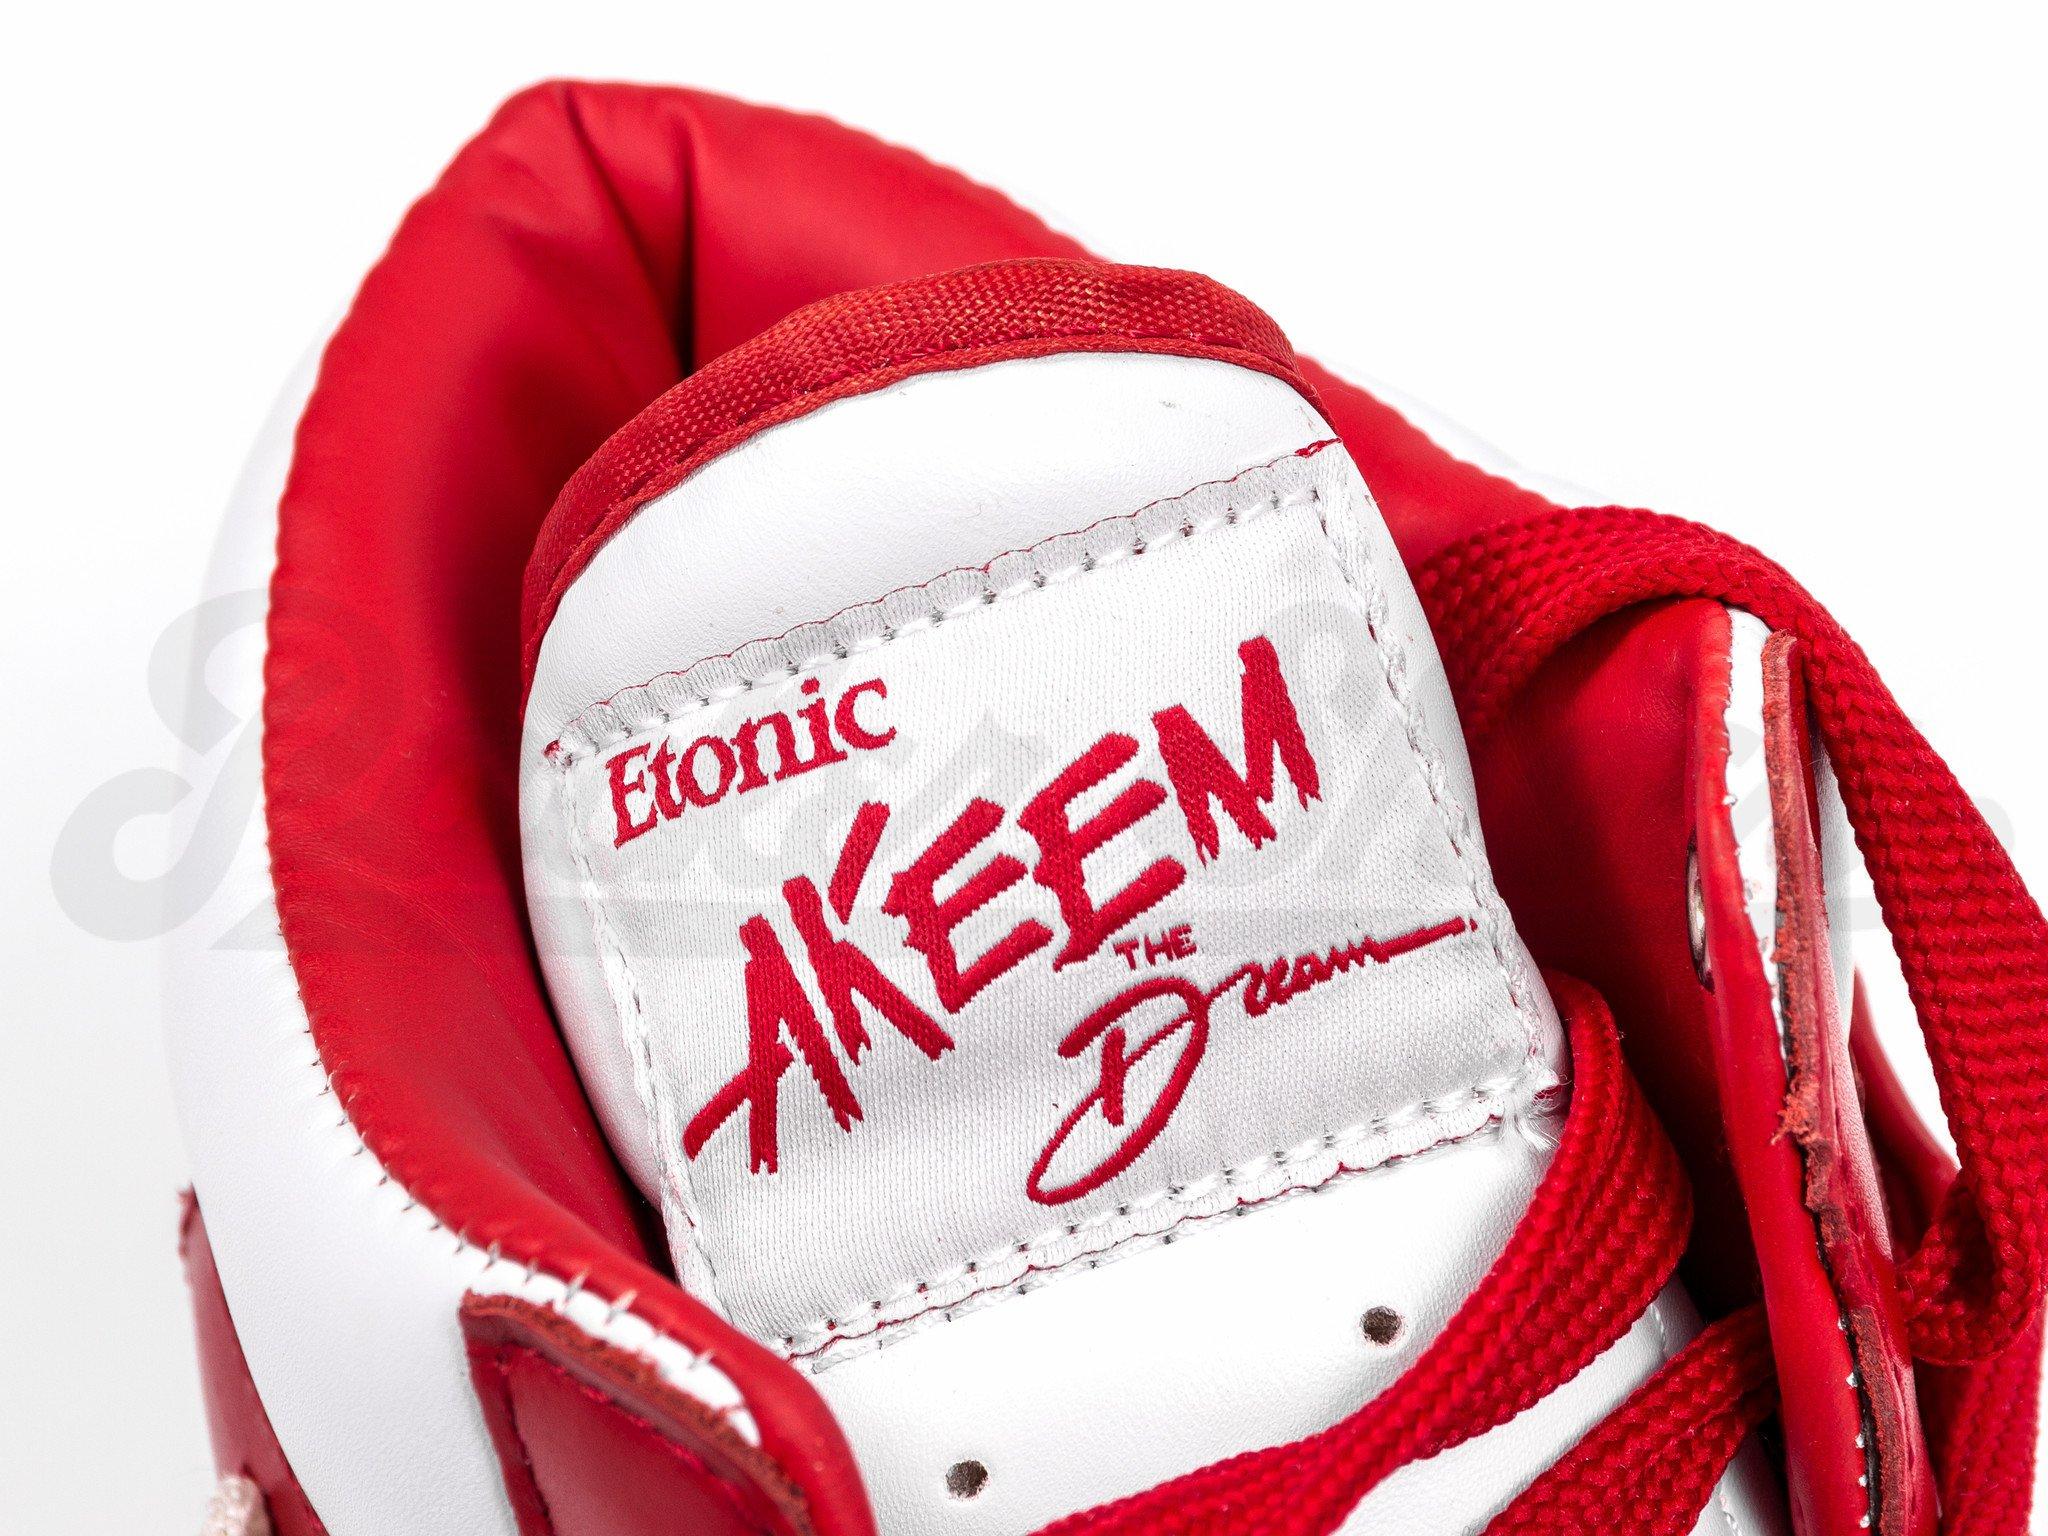 release-reminder-etonic-akeem-the-dream-white-red-3